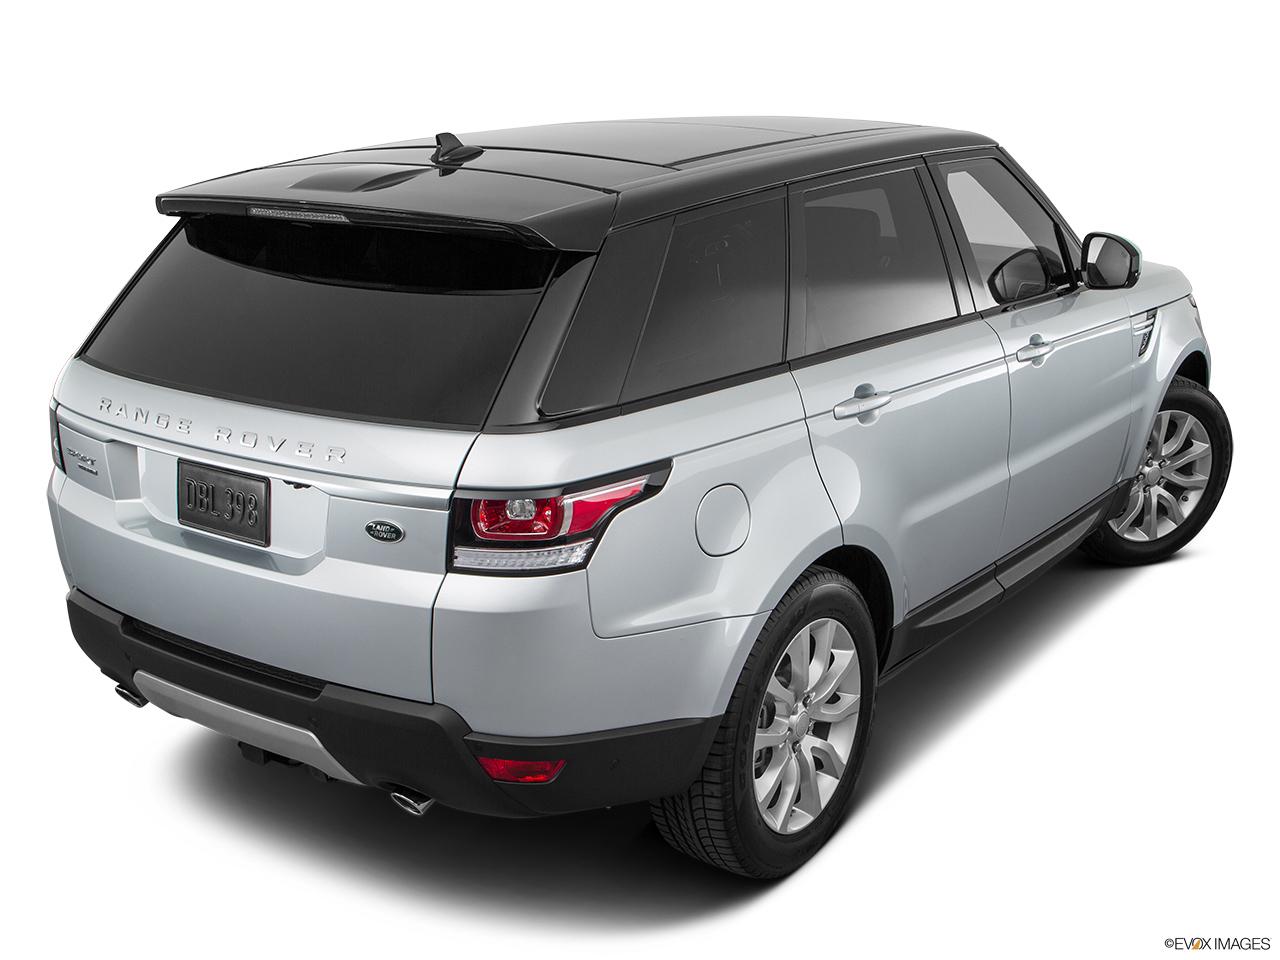 car pictures list for land rover range rover sport 2016 autobiography uae yallamotor. Black Bedroom Furniture Sets. Home Design Ideas